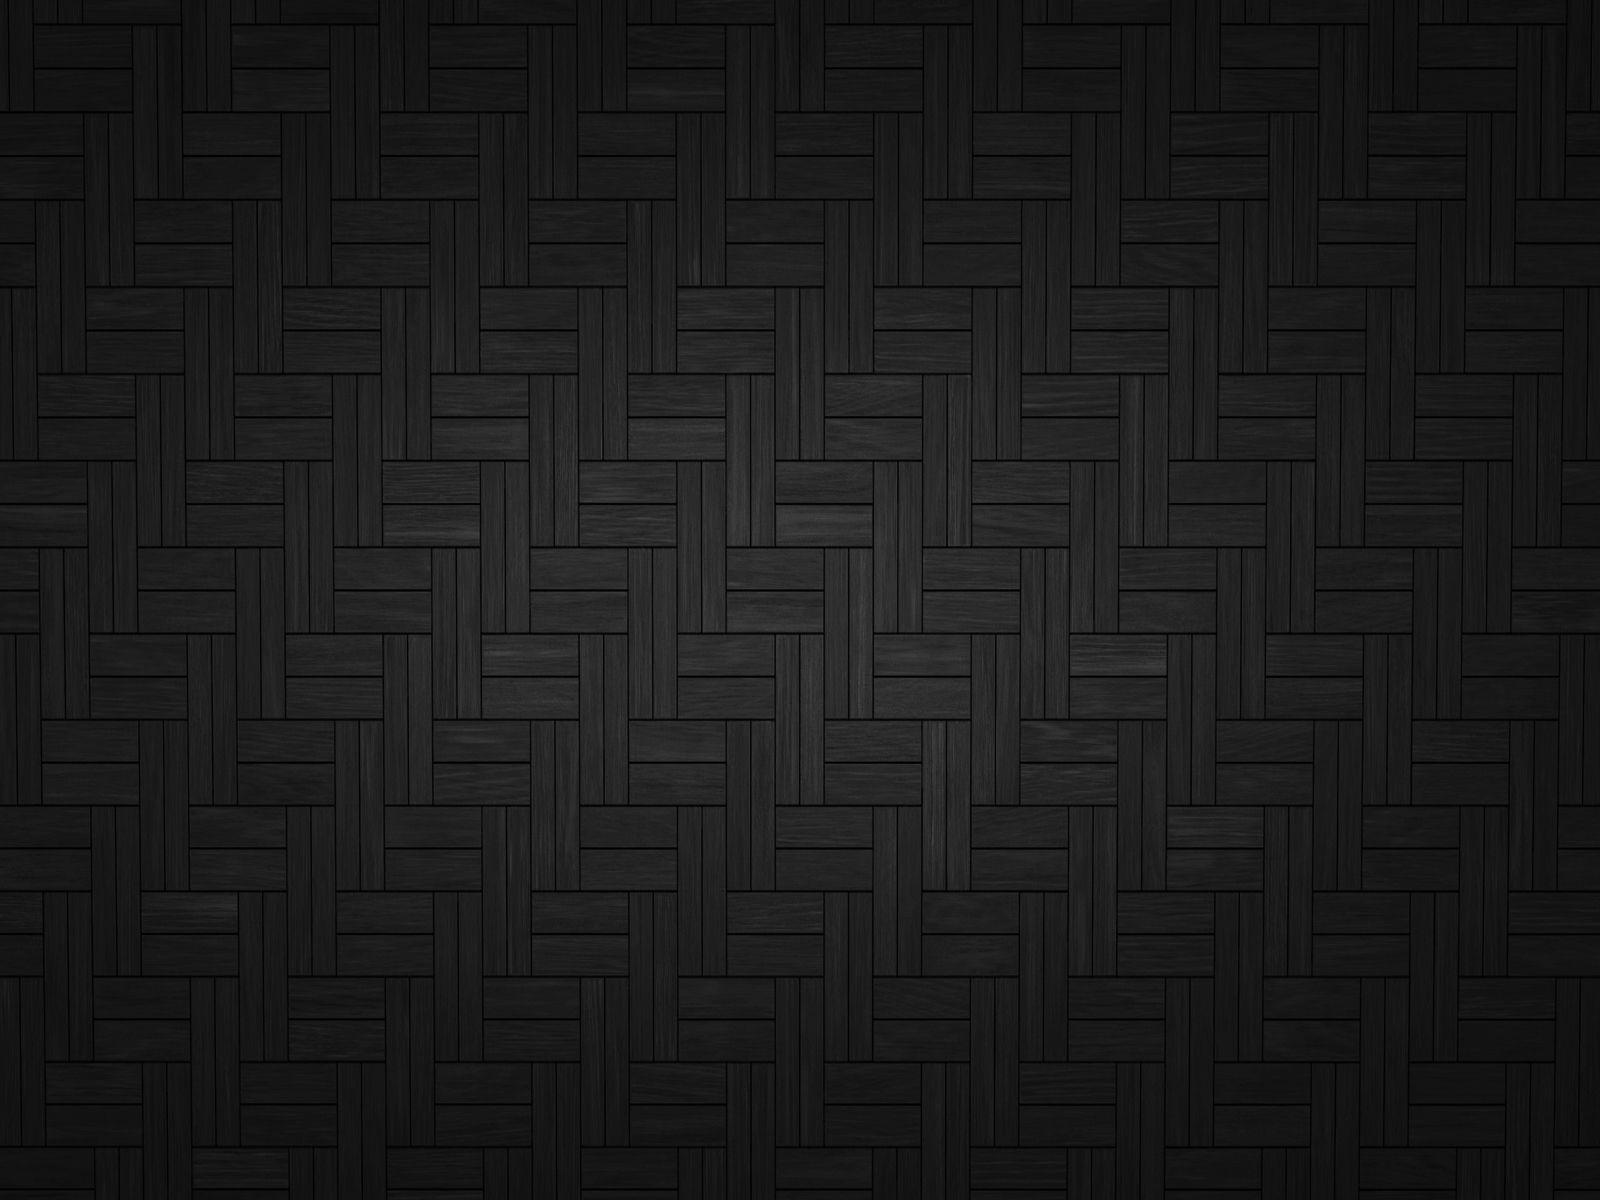 Black Wood Wallpaper | Txtre | Pinterest | Material